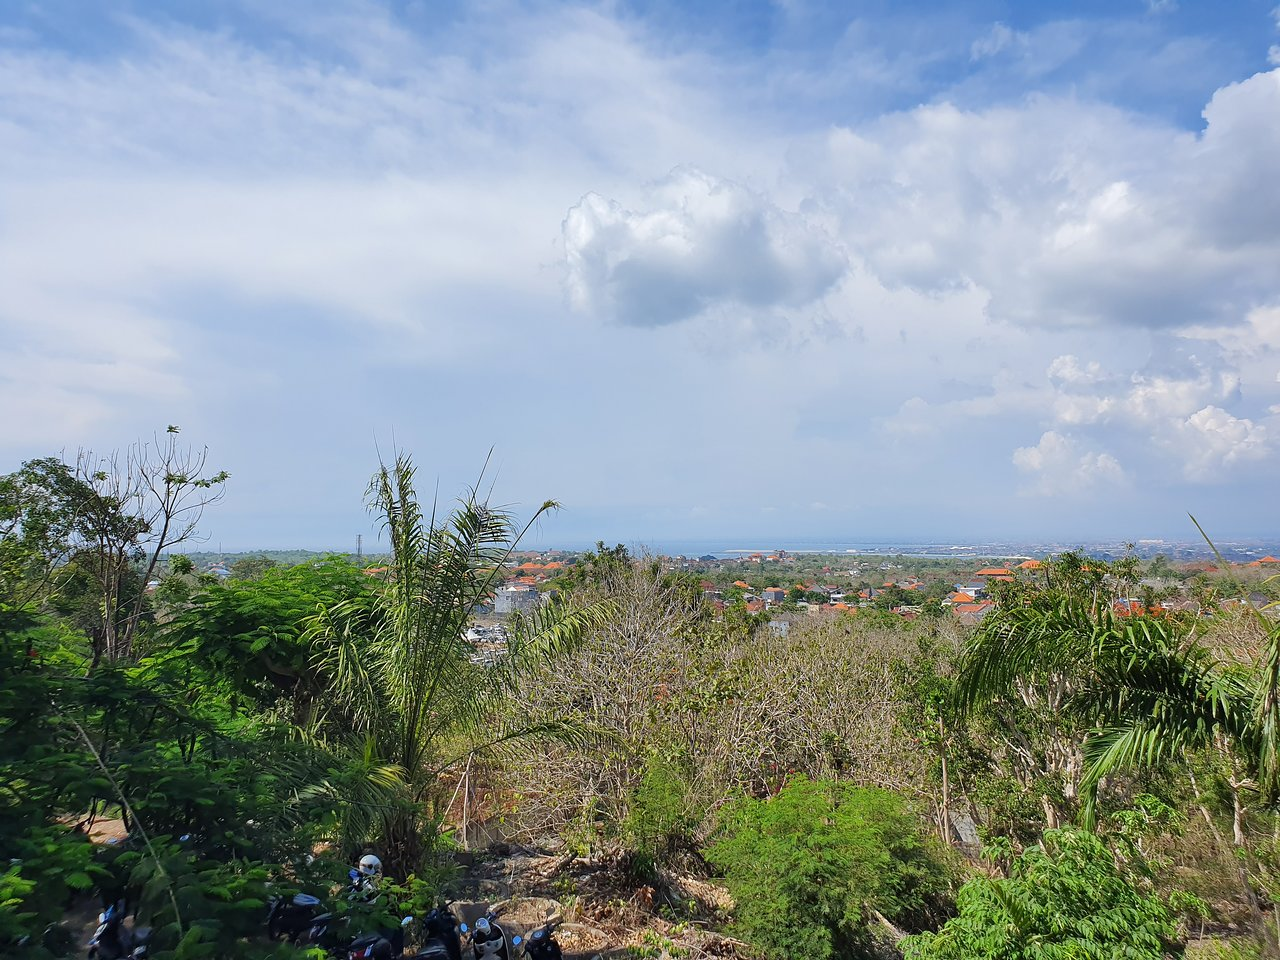 Garuda Wisnu Kencana Cultural Park Ungasan 2020 All You Need To Know Before You Go With Photos Tripadvisor